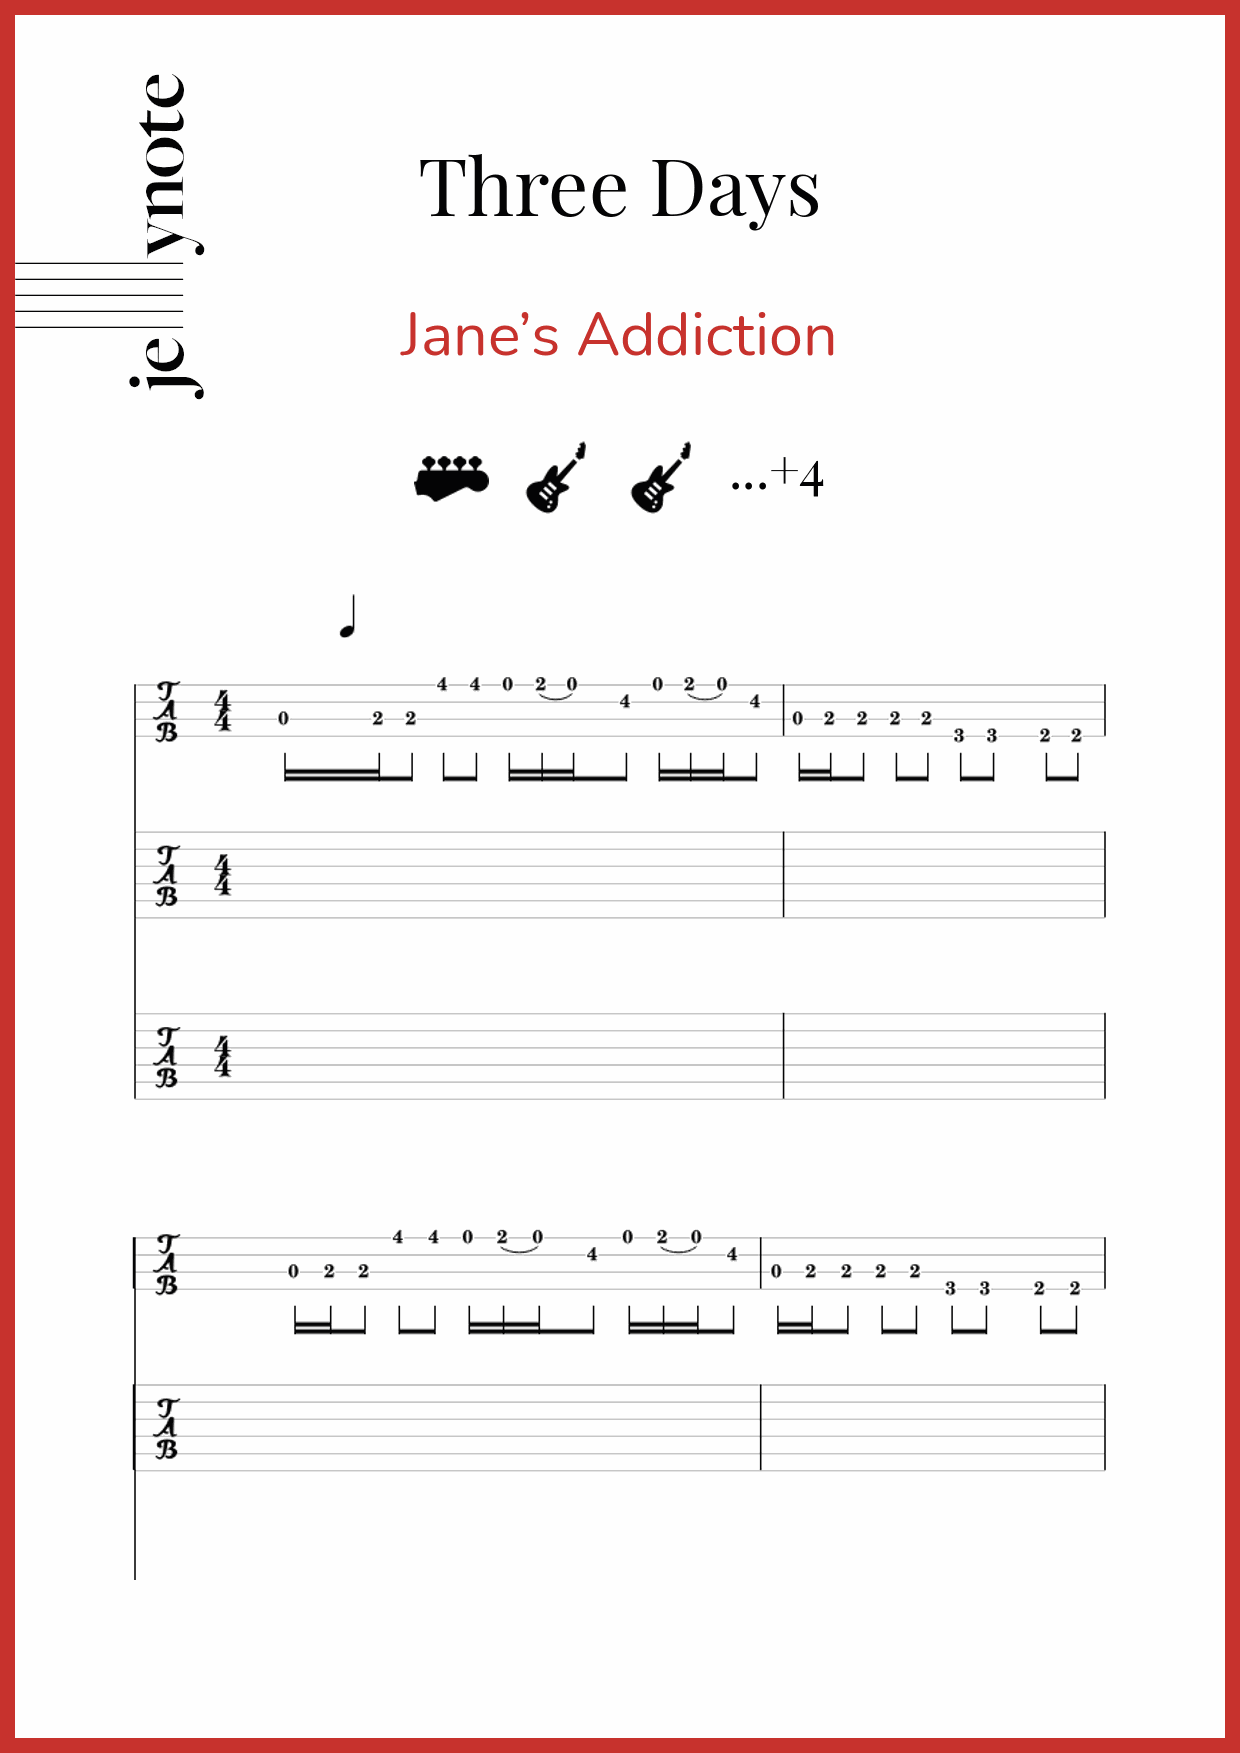 Jane&15;s Addiction